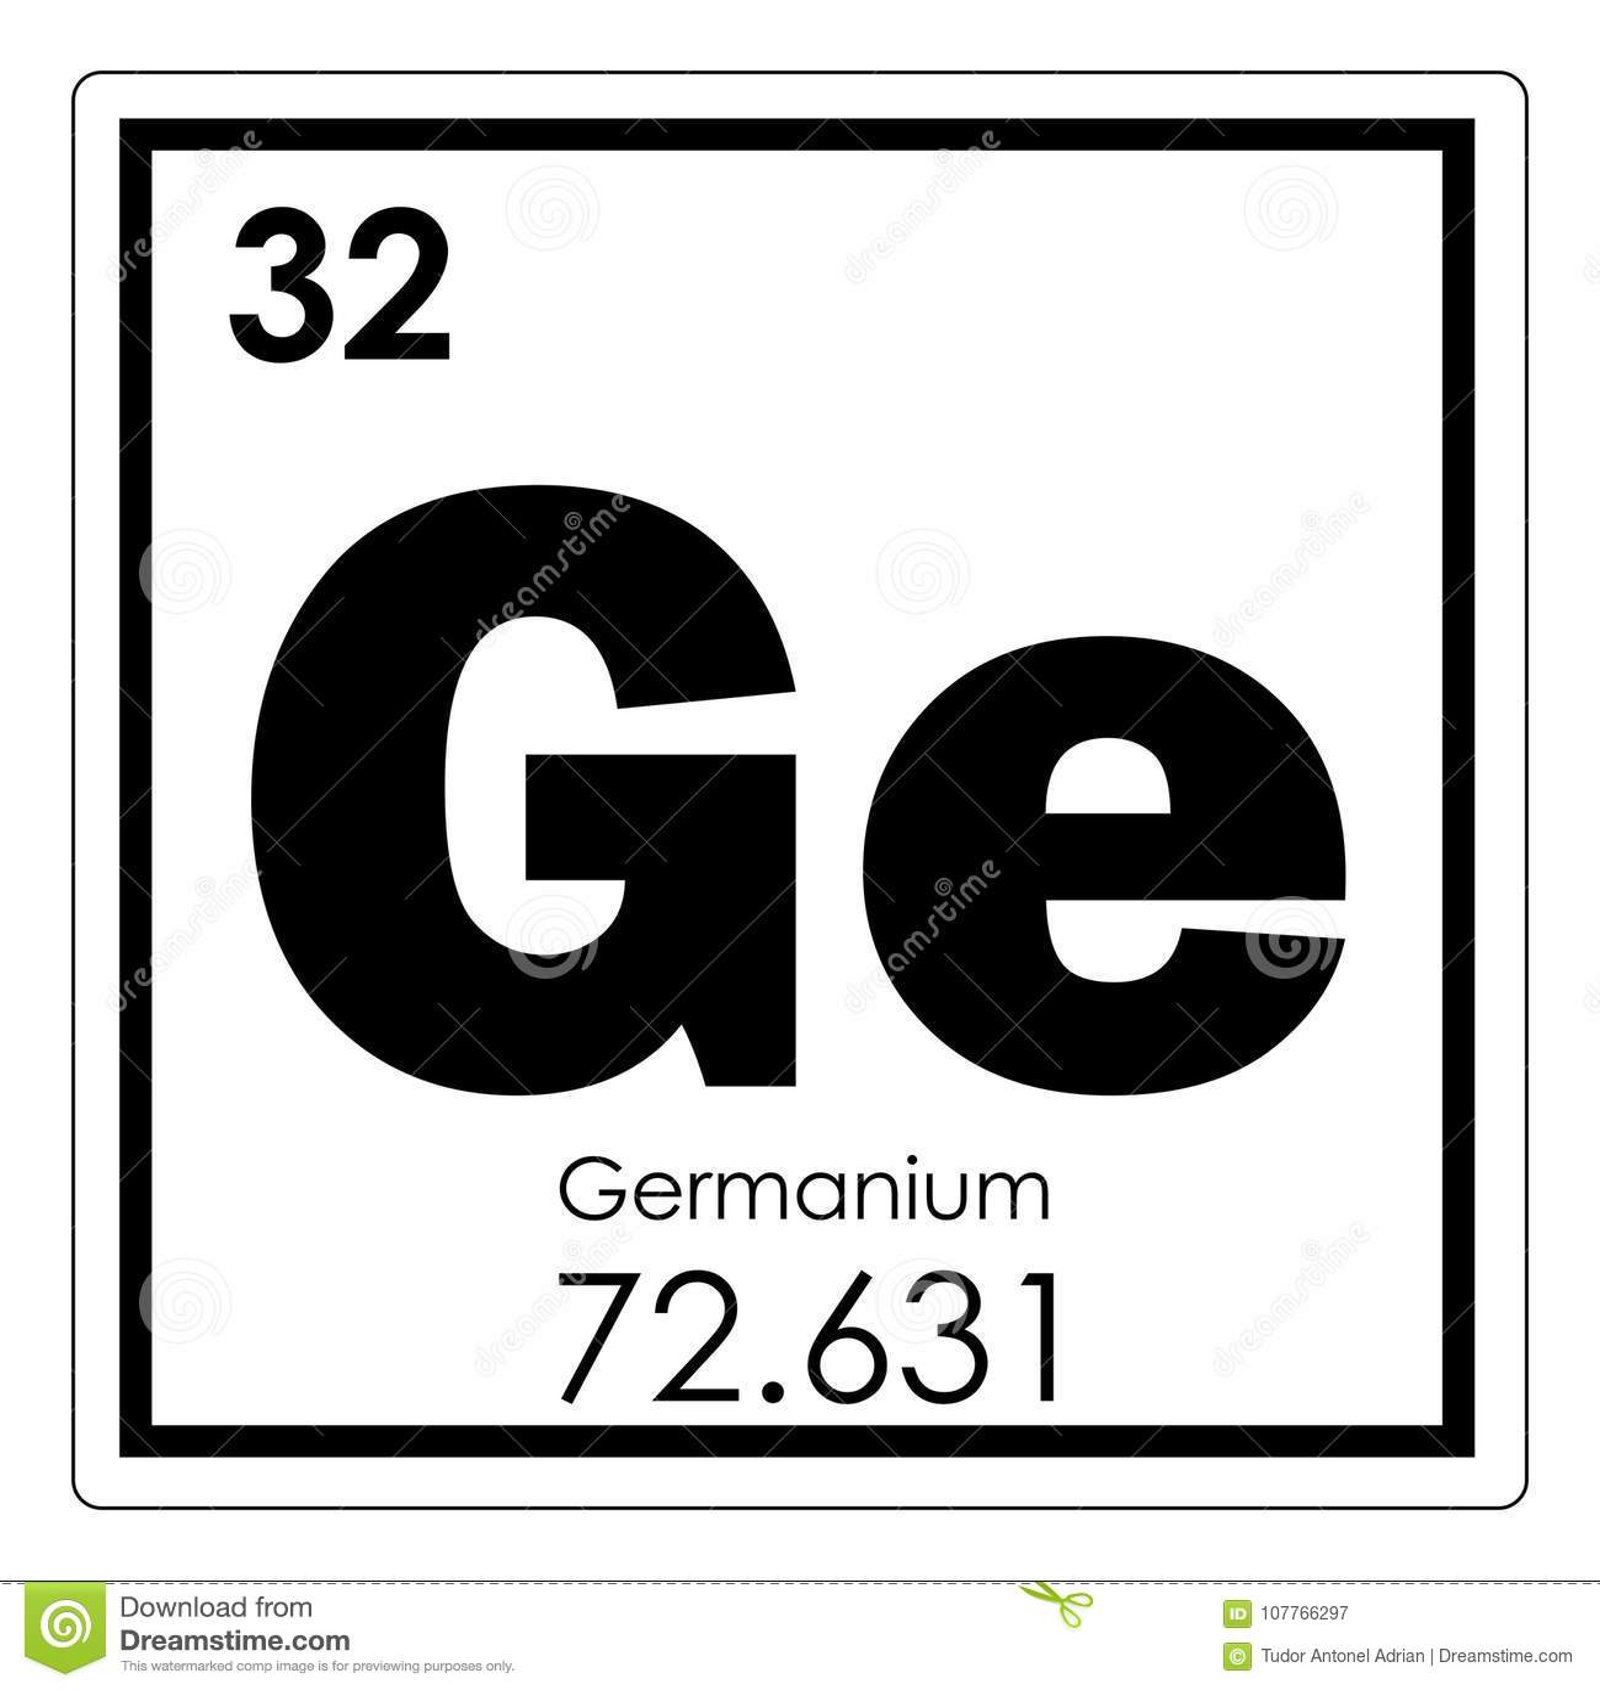 Germanium Chemical Element Stock Illustration Illustration Of